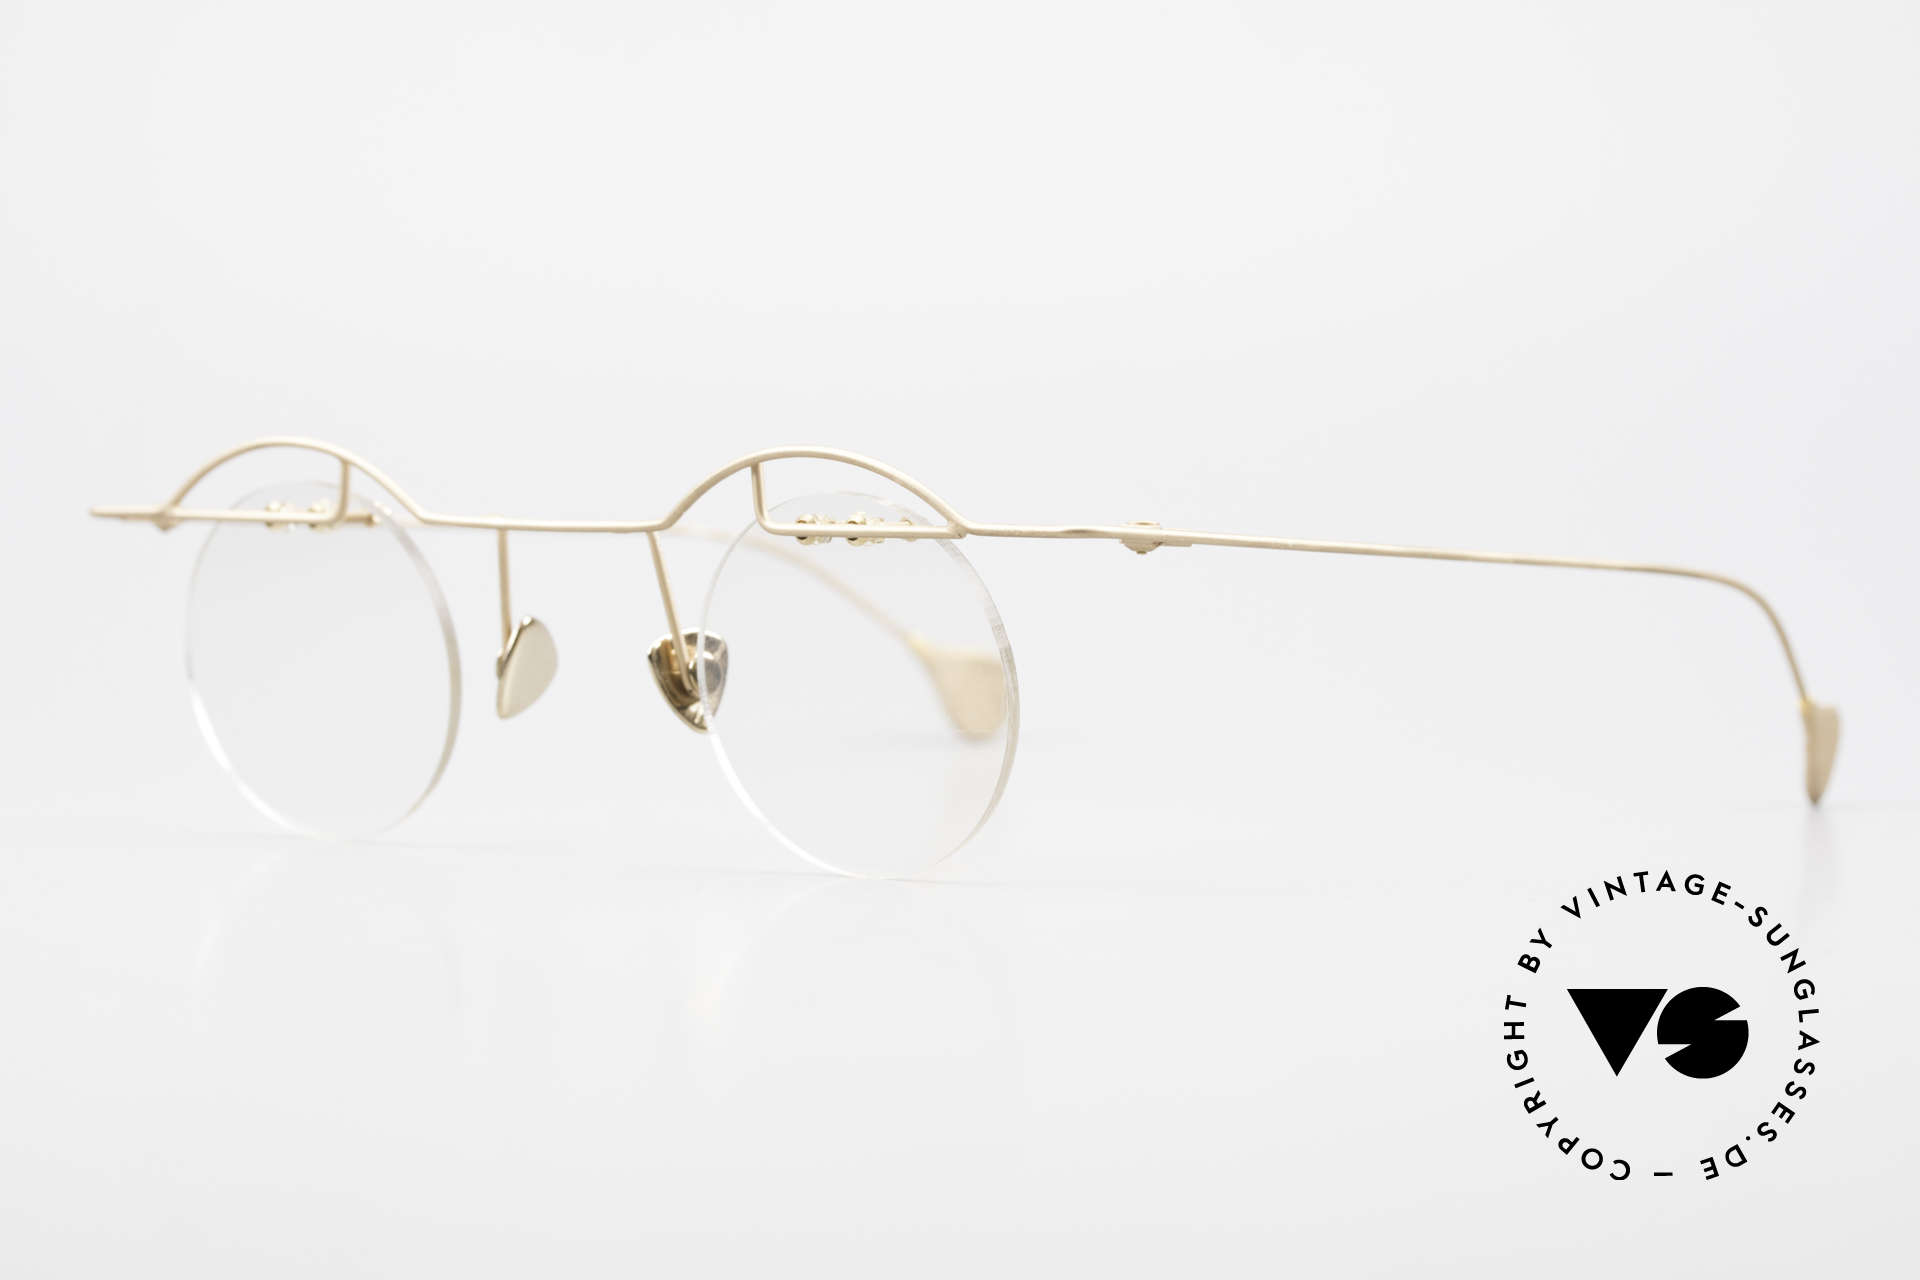 Paul Chiol 02 Bauhaus Eyeglasses Rimless, an unworn masterpiece with original DEMO lenses, Made for Men and Women